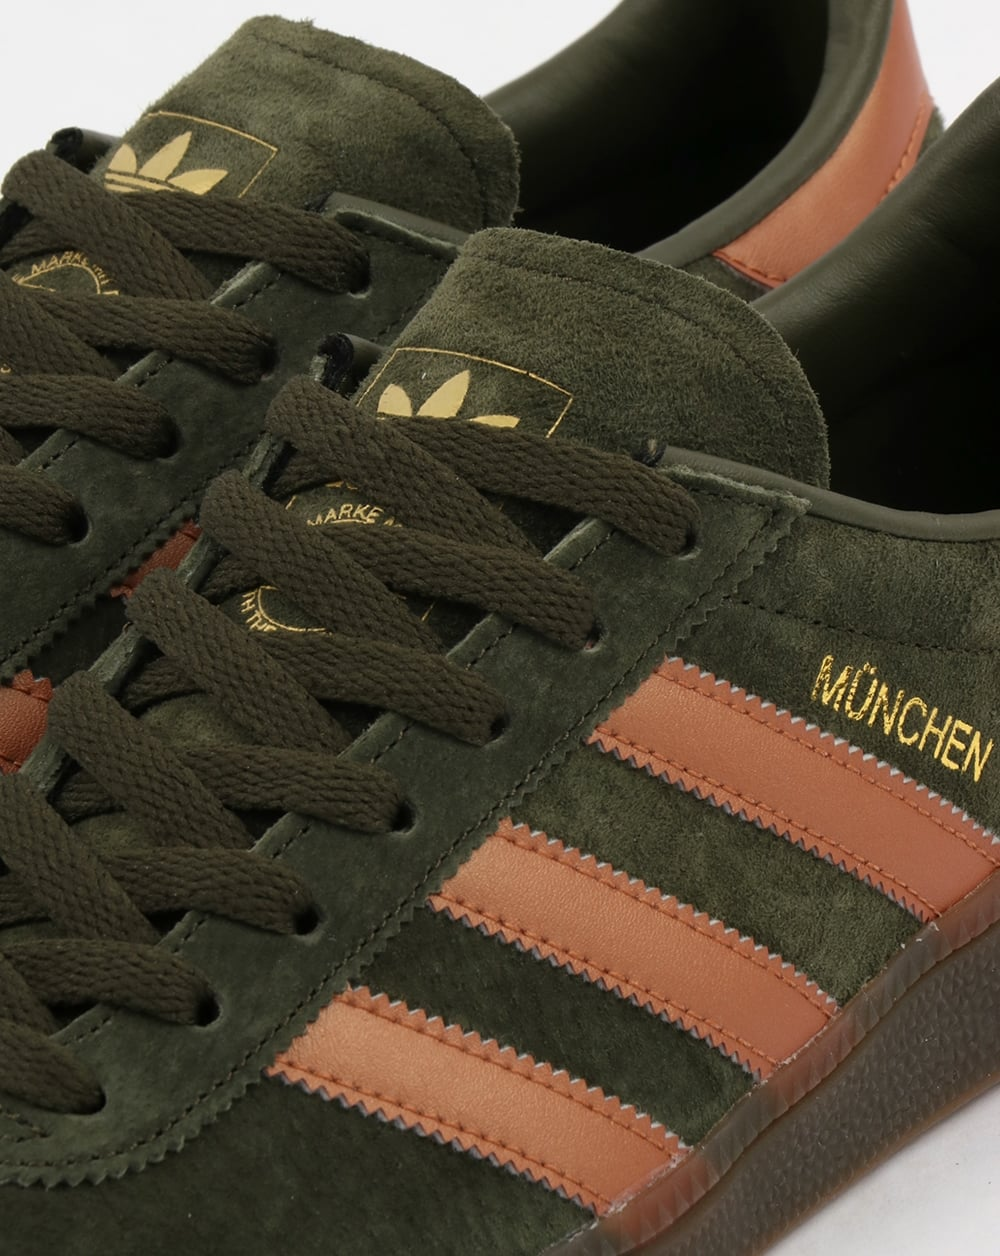 Adidas Munchen Trainers Night Cargo